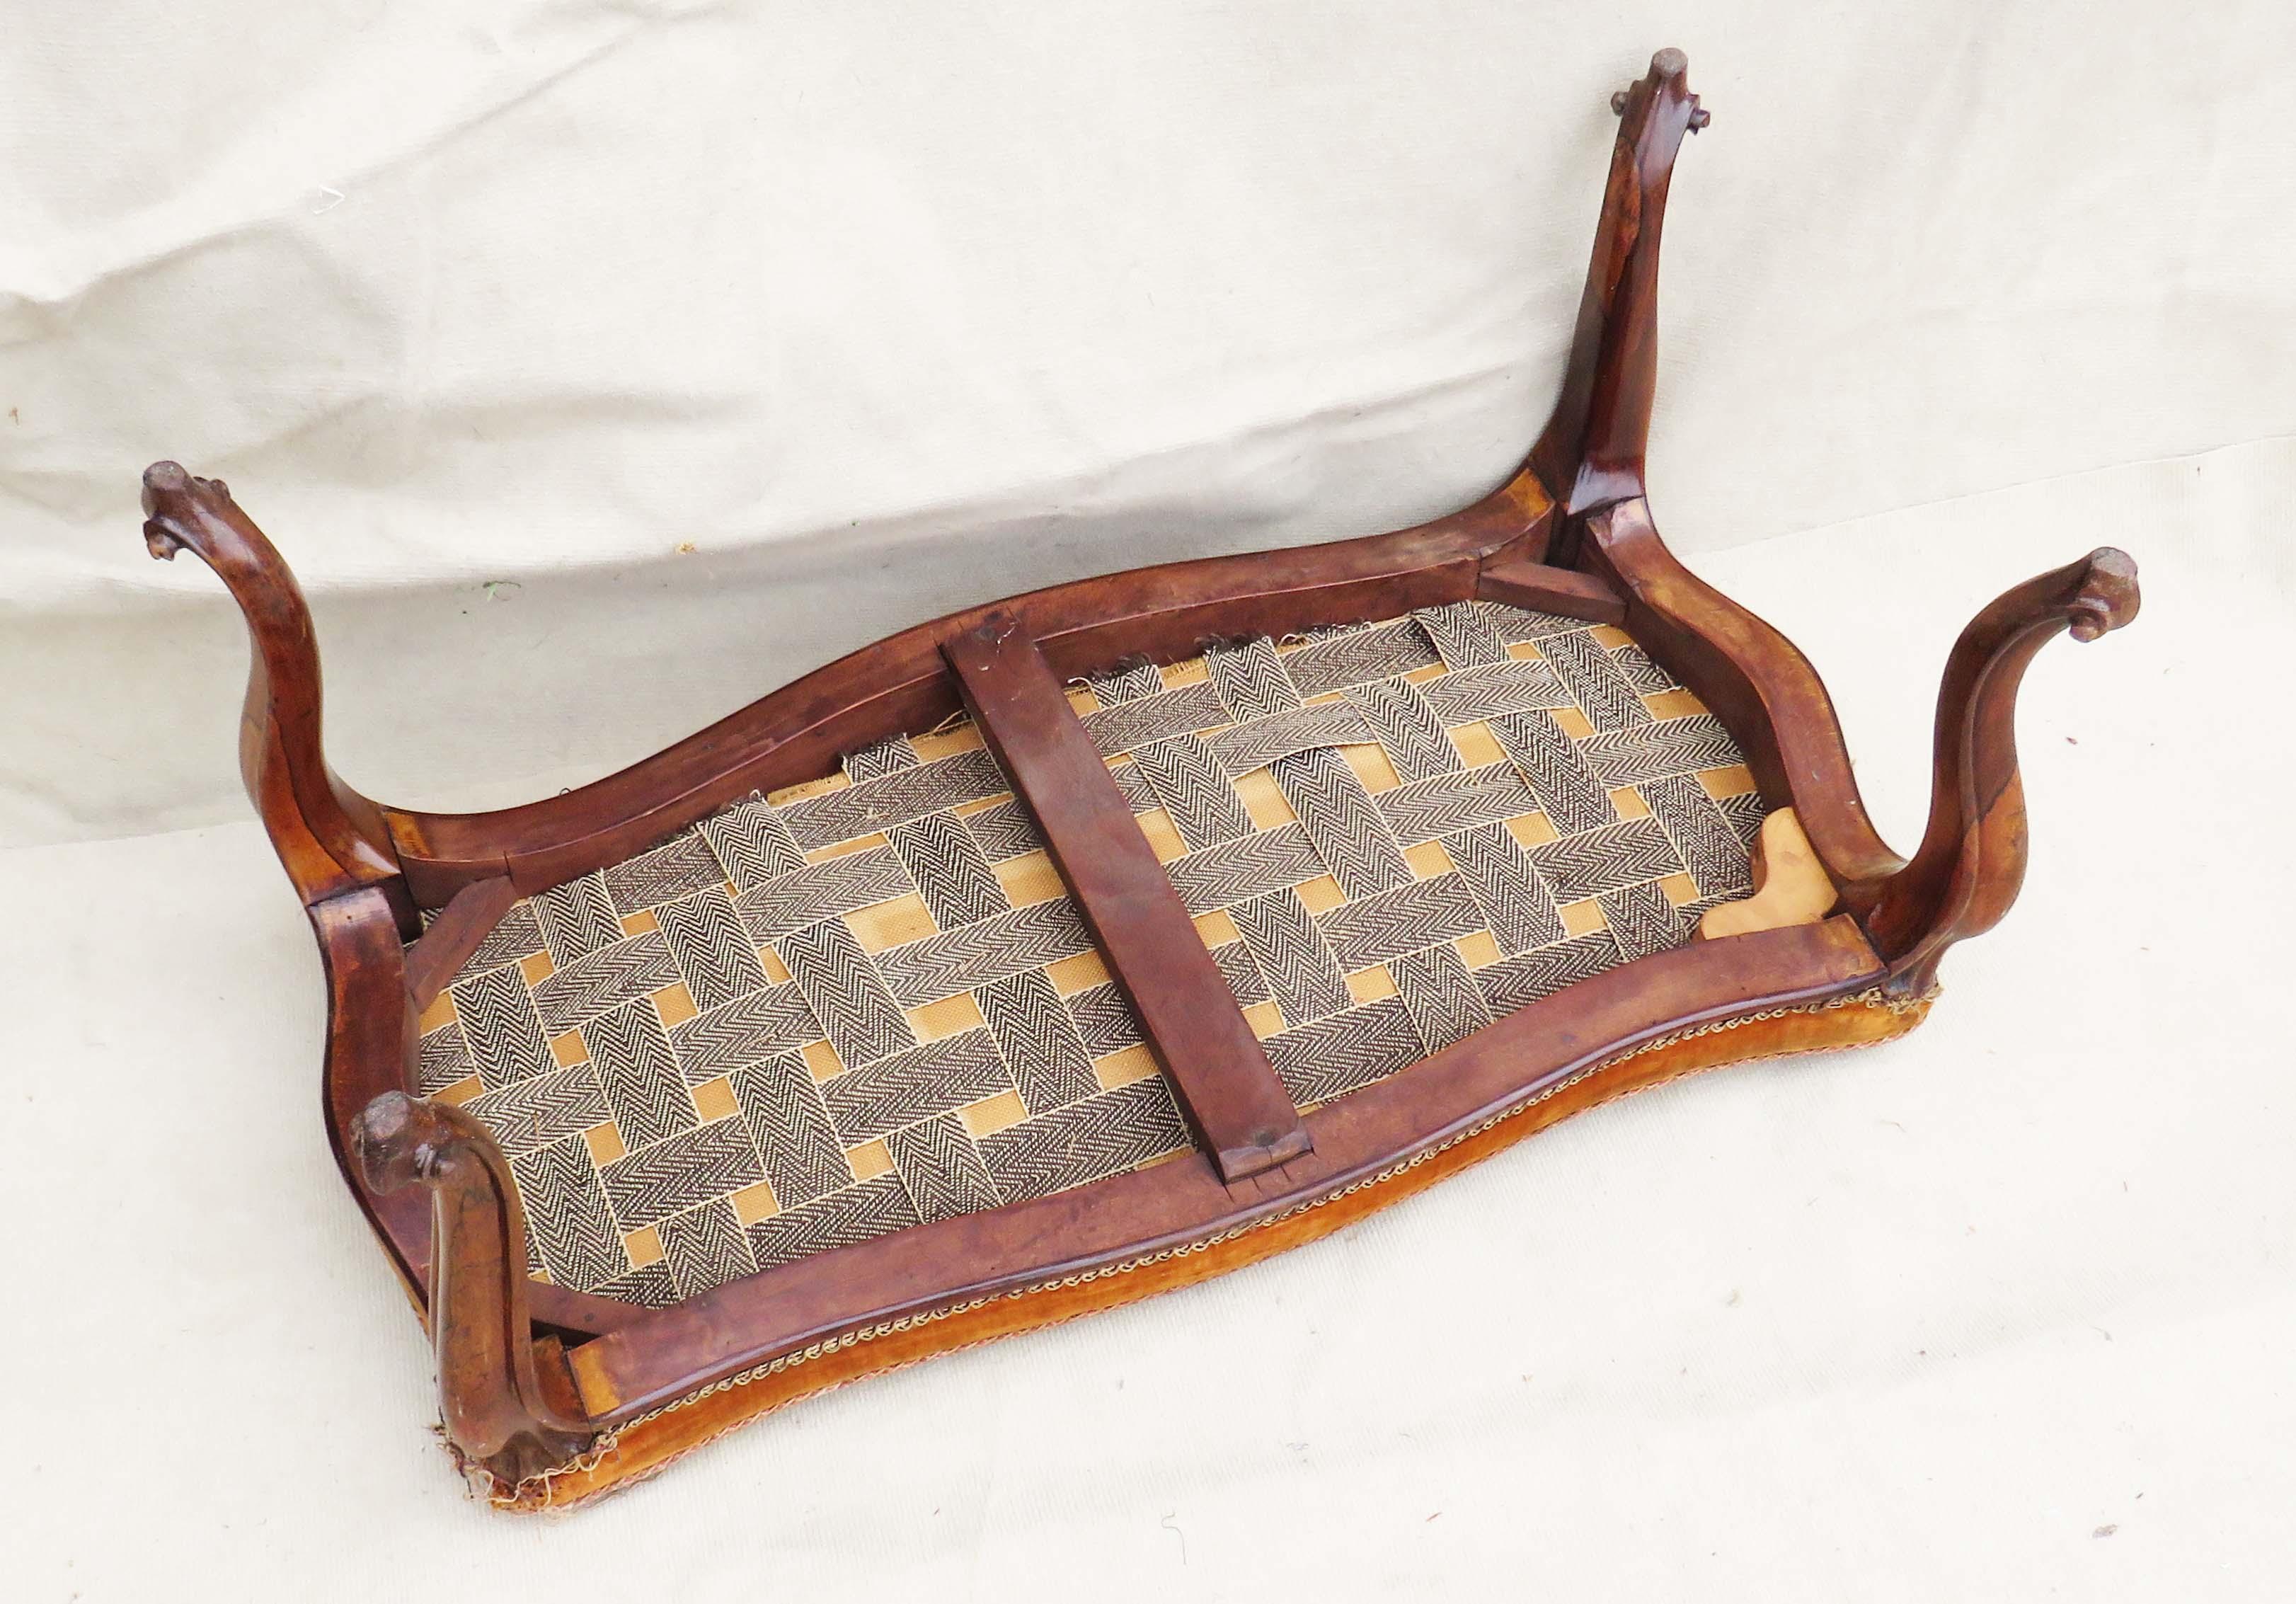 Lot 49 - Victorian Rosewood Duet Stool, English 19th Century